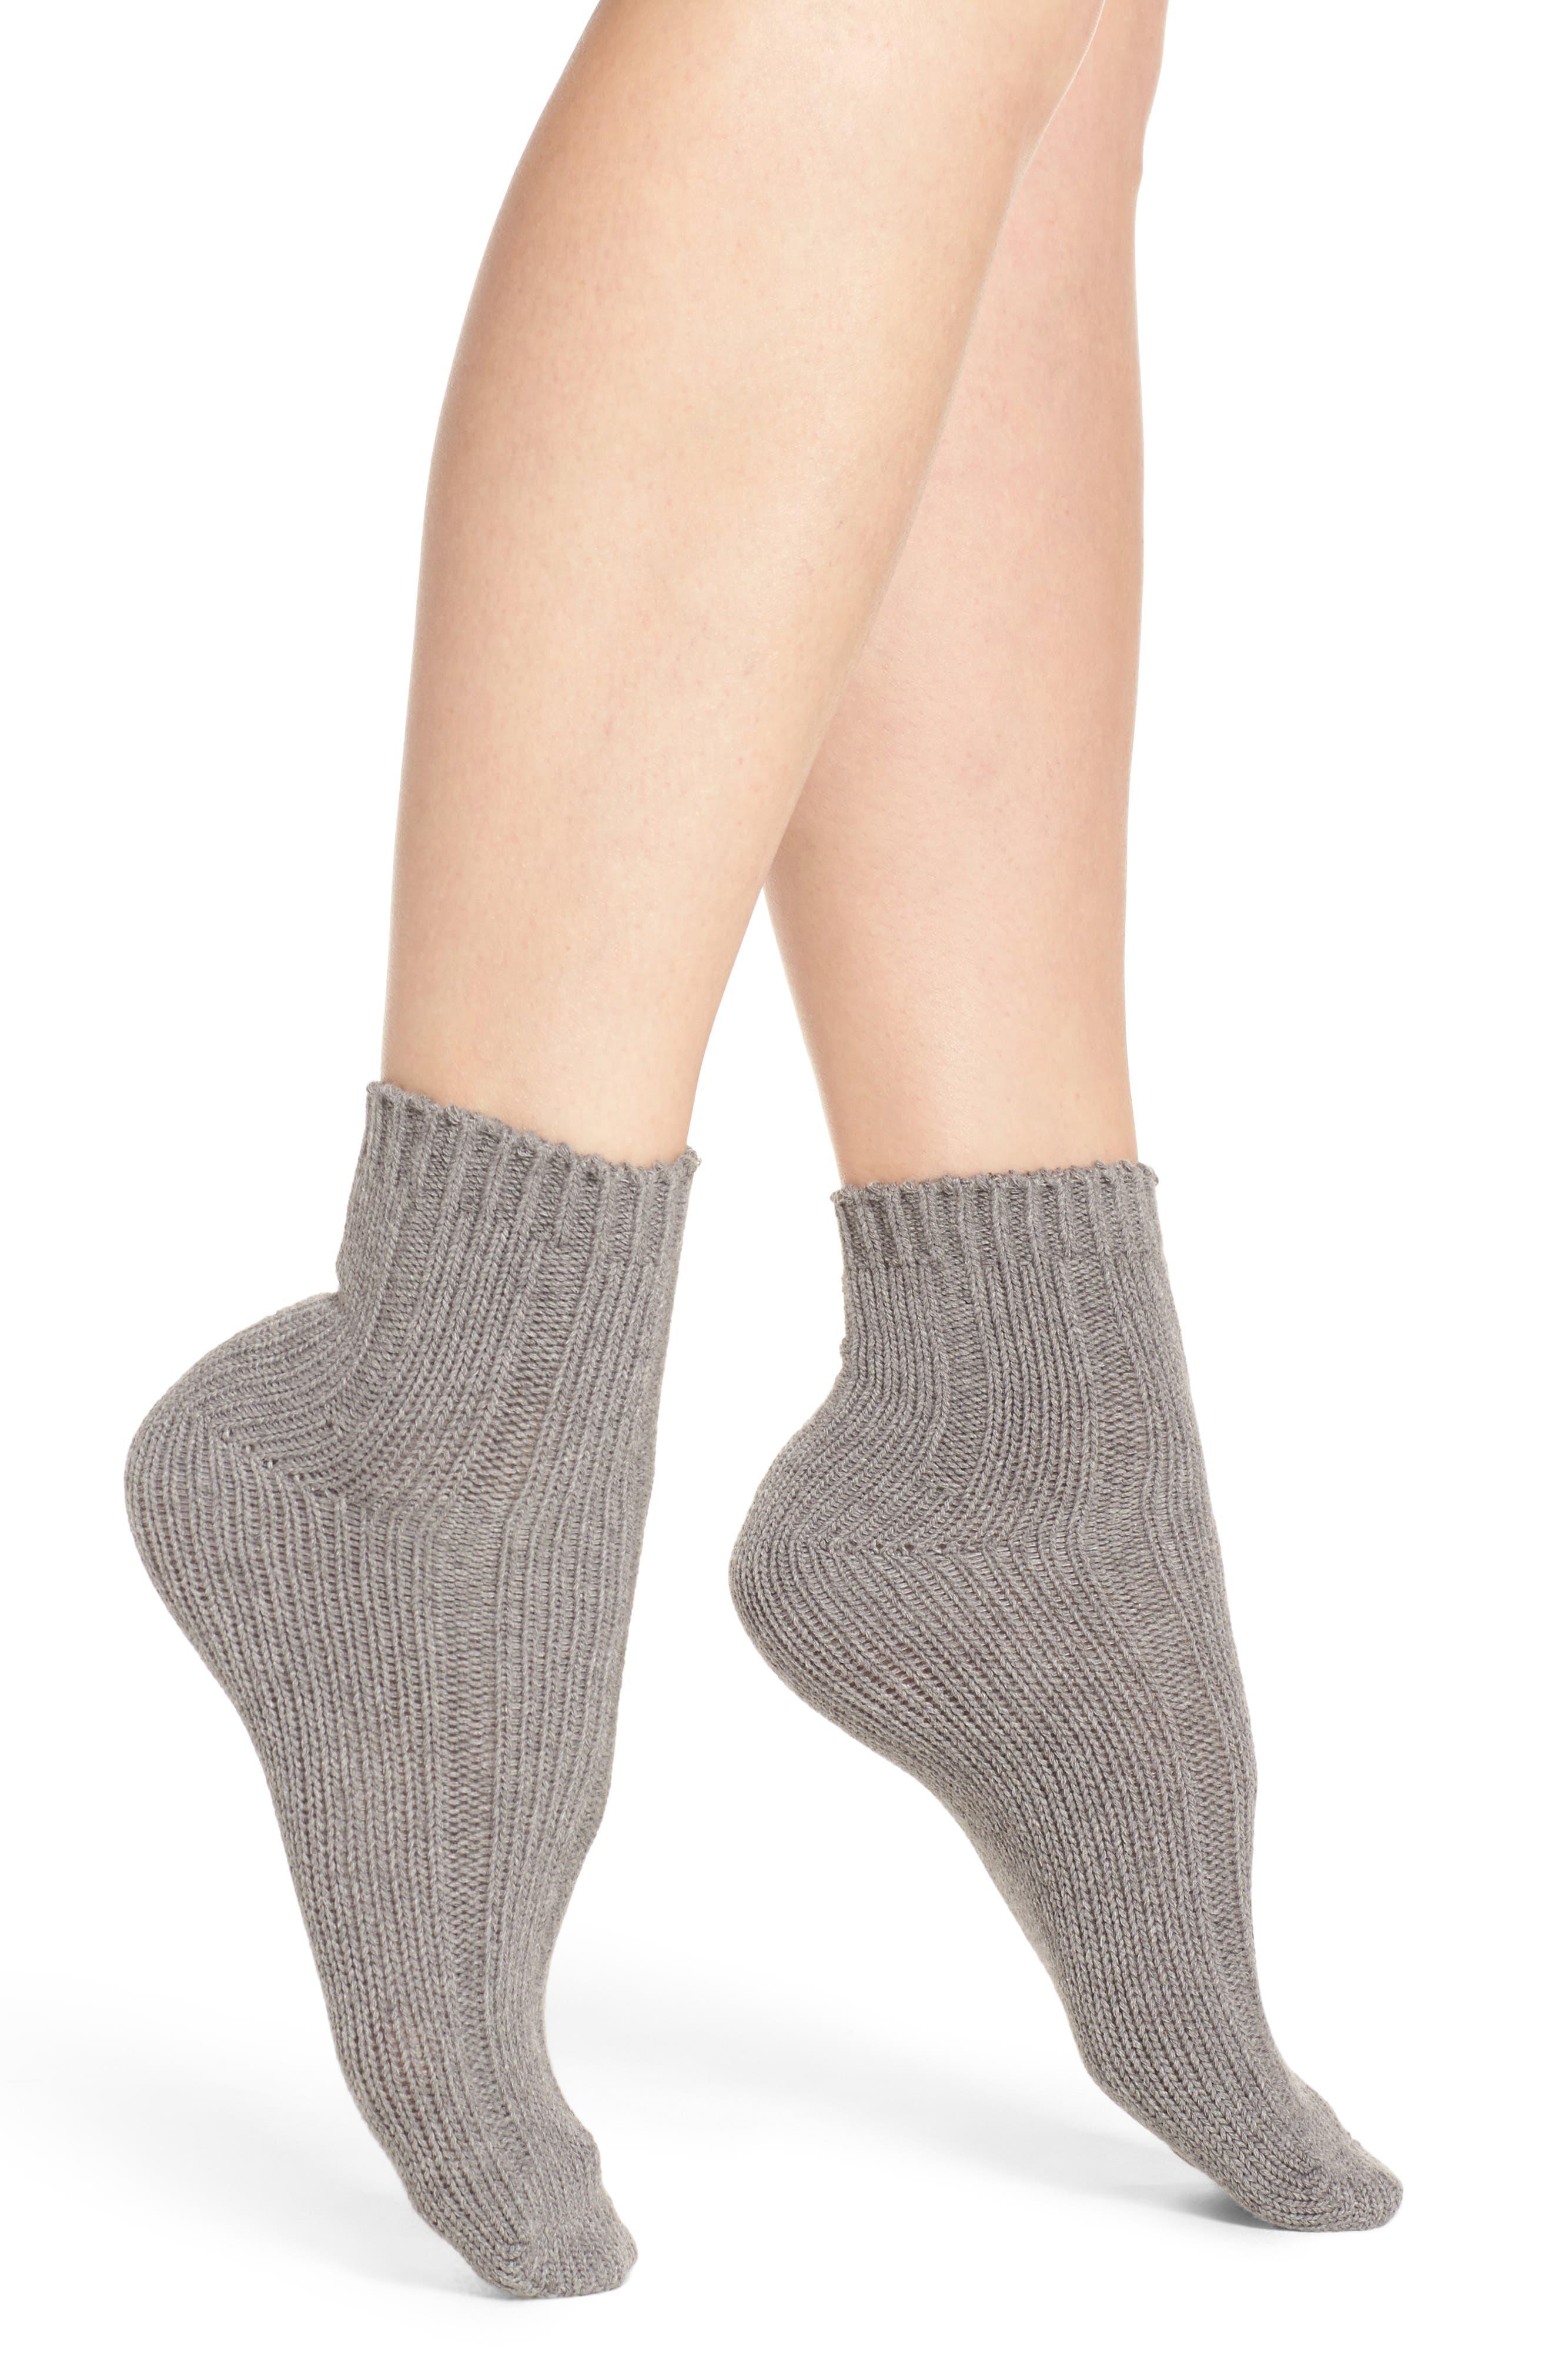 Variegated Rib Crew Socks,                         Main,                         color, Grey